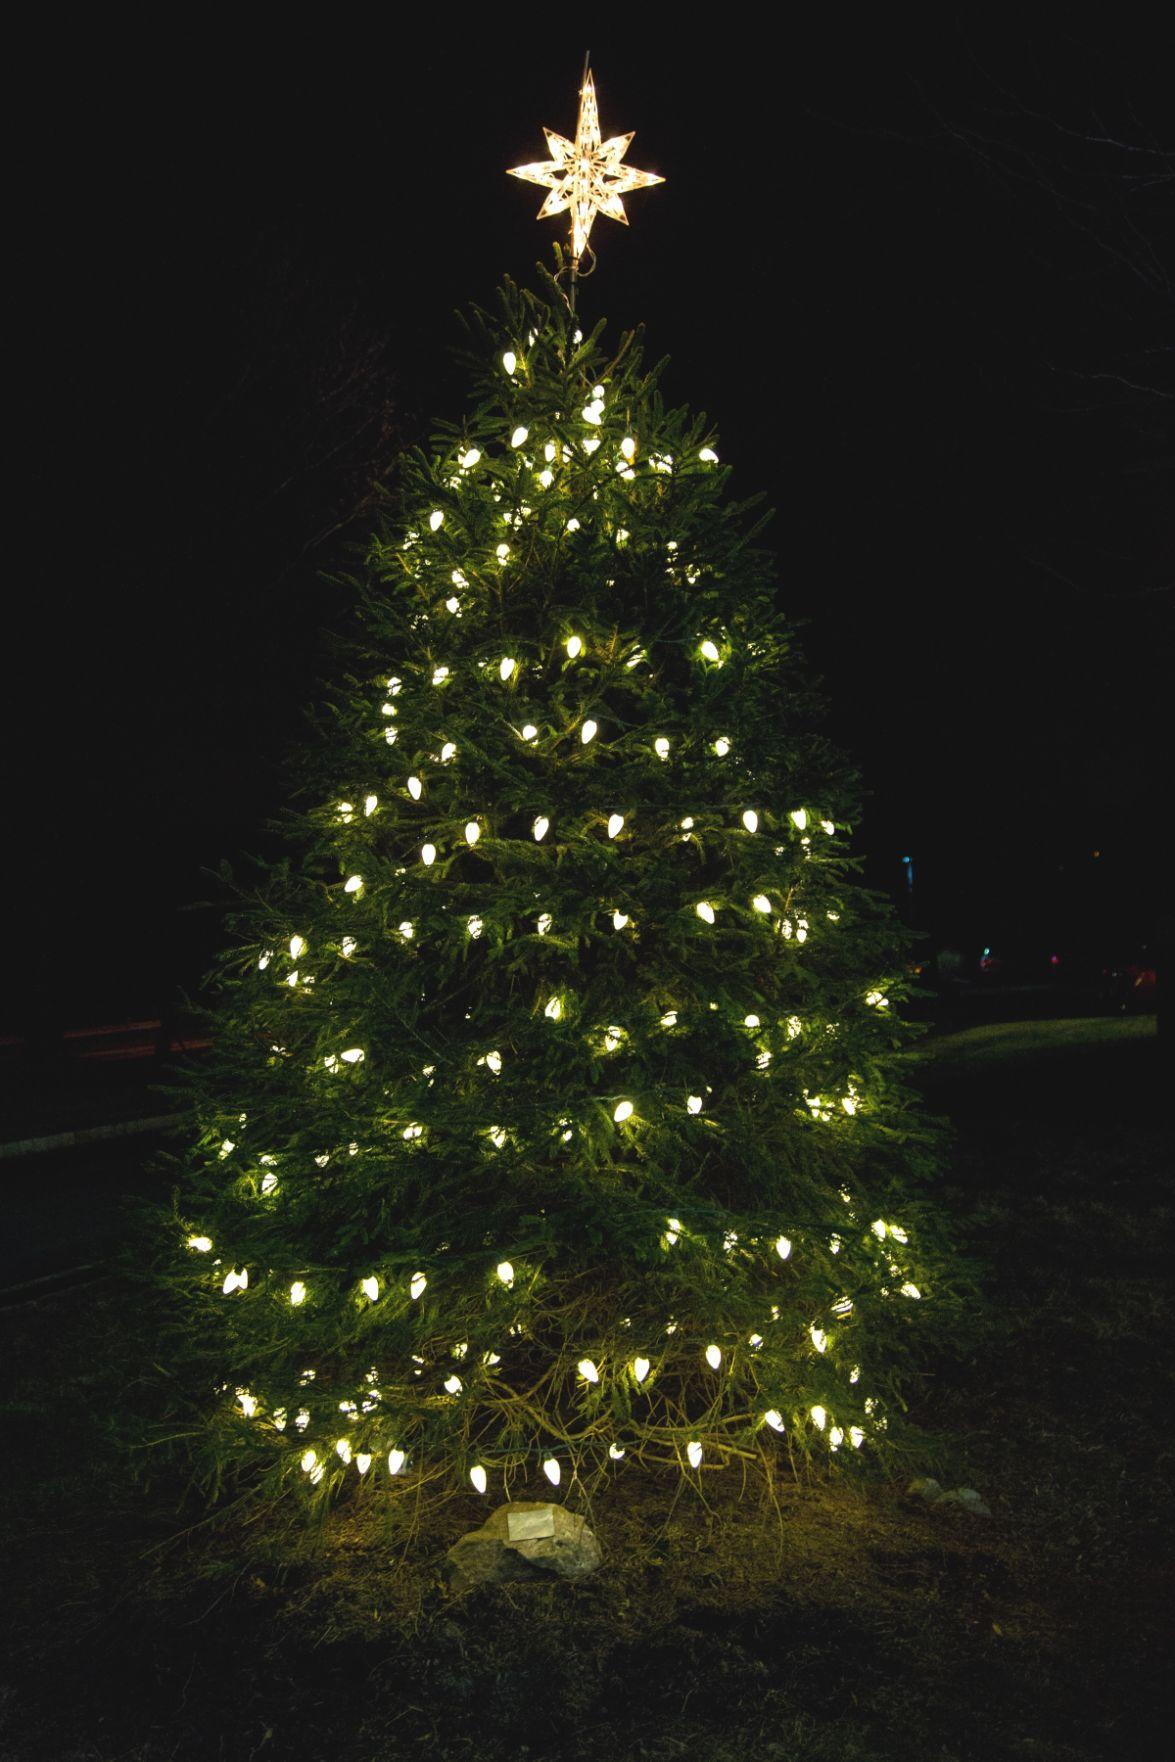 'Making Spirits Bright' at Readington's 13th annual holiday tree lighting